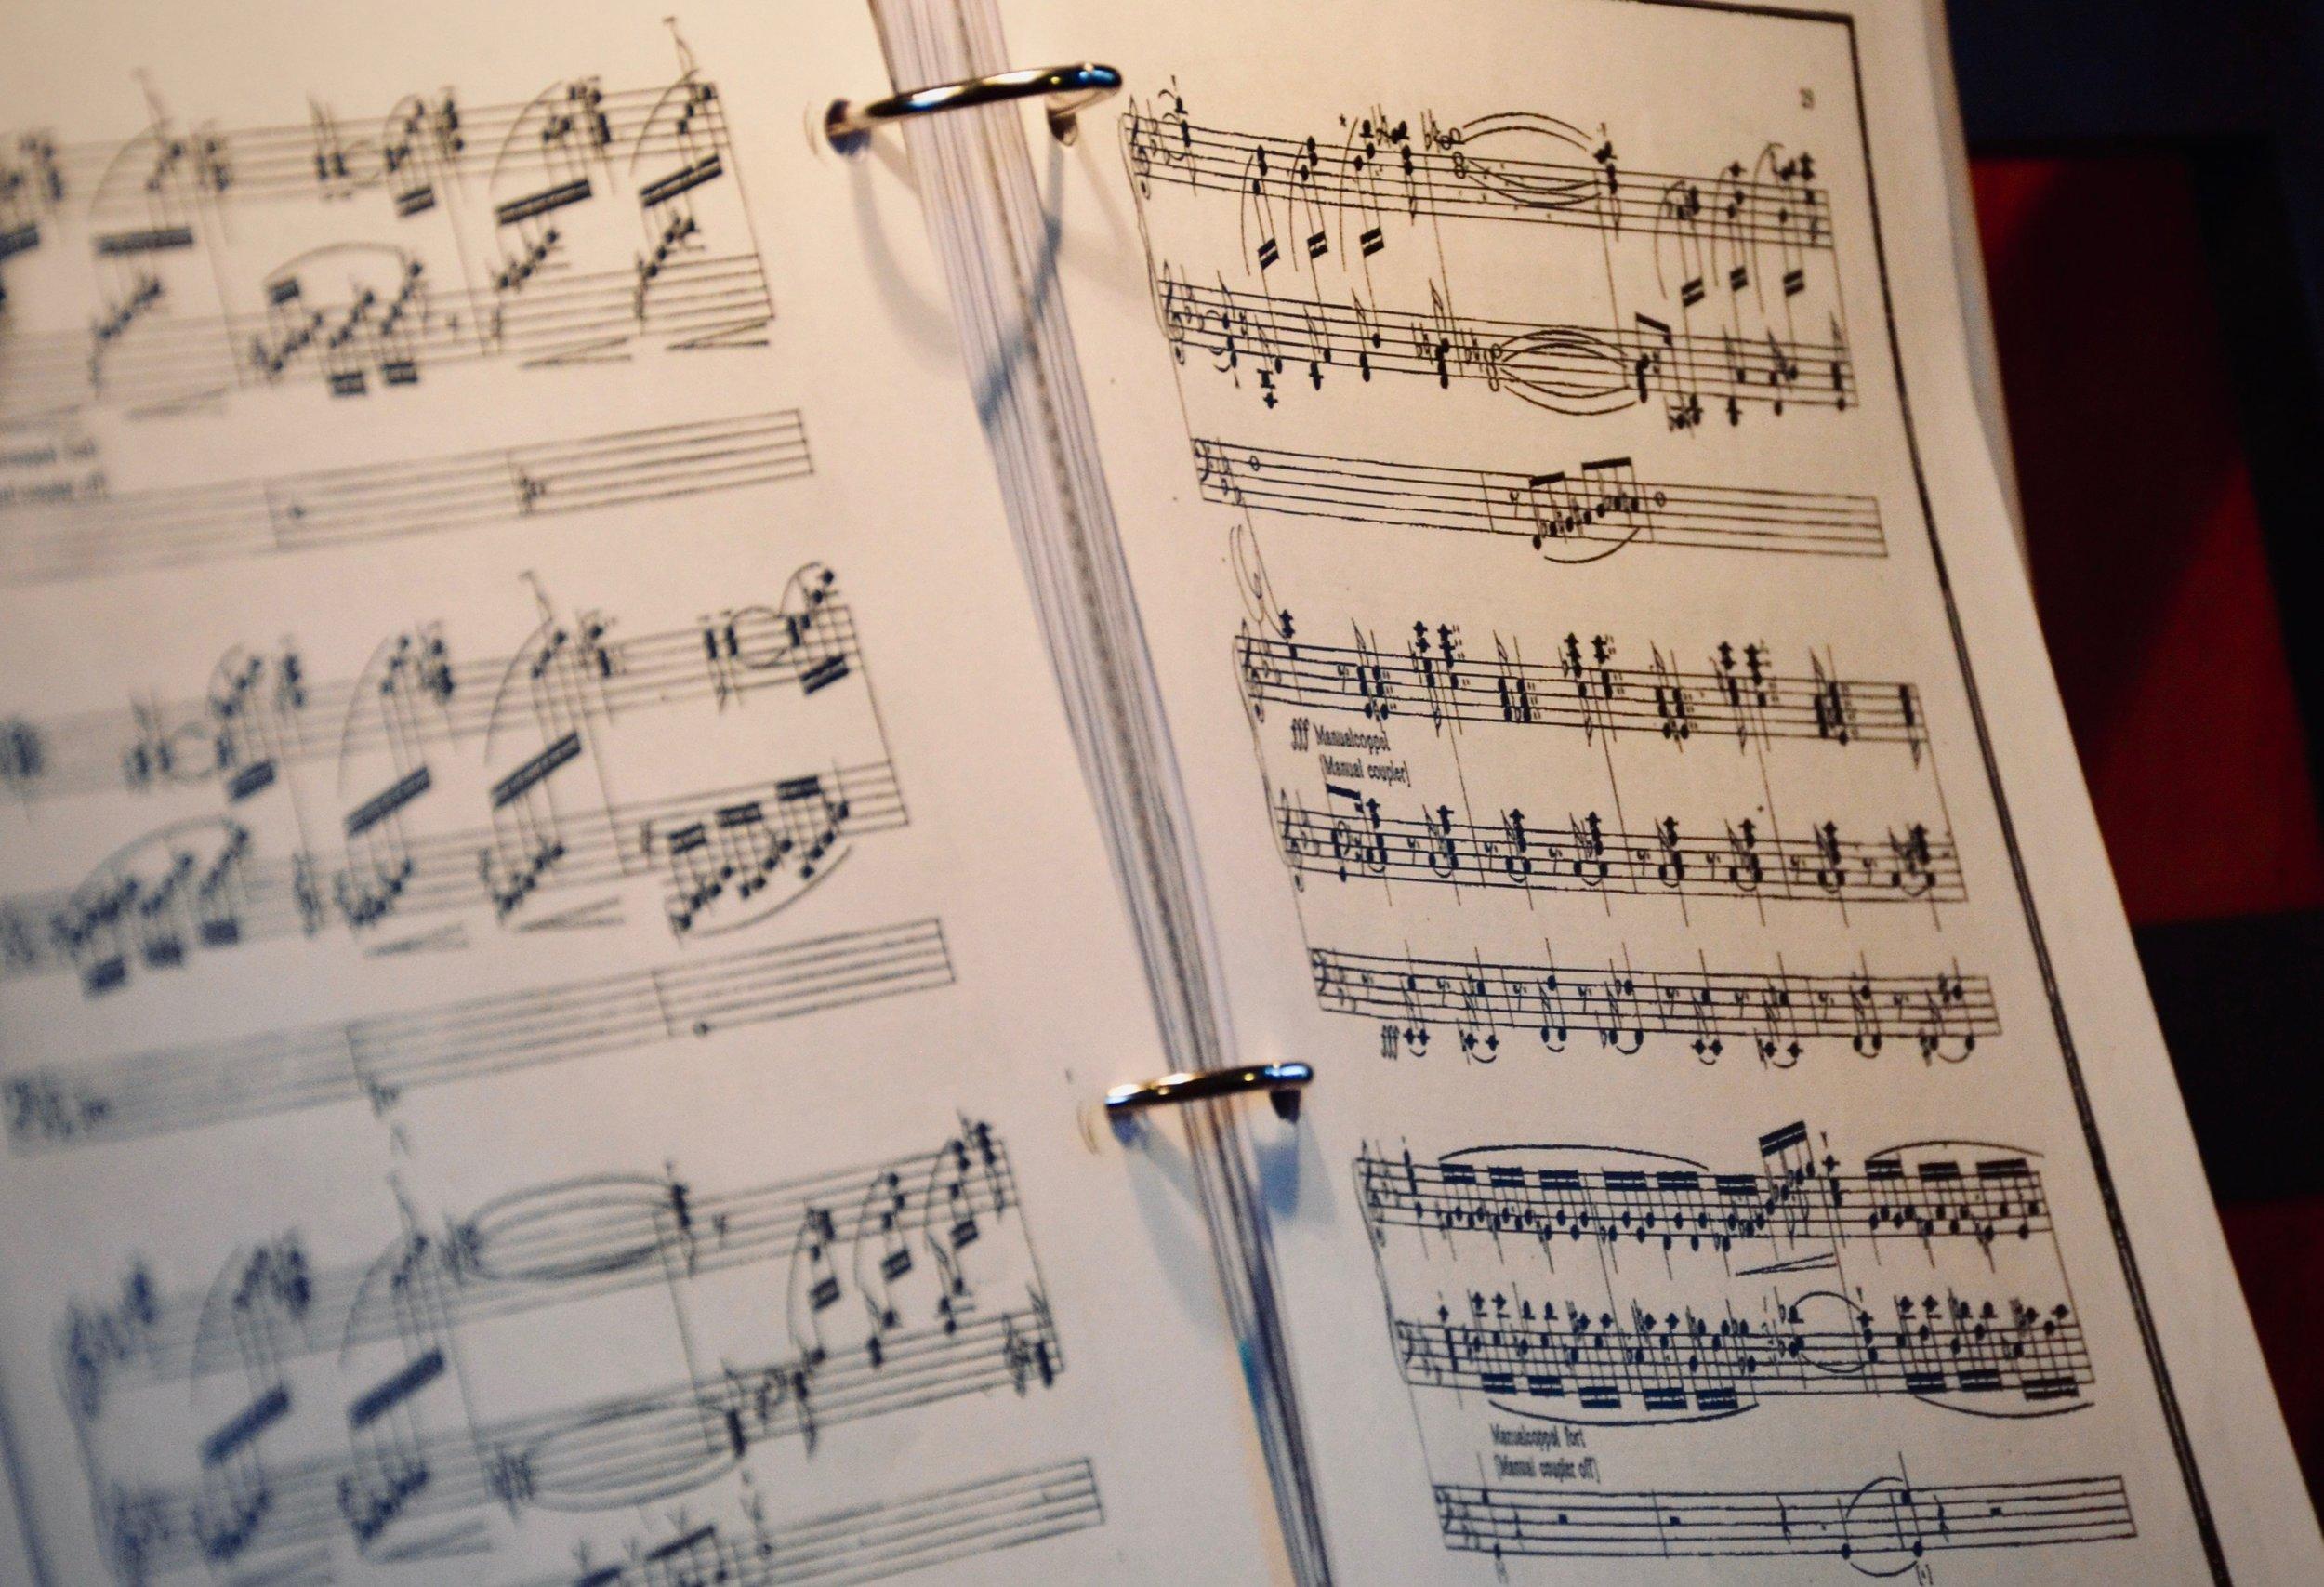 Score of Julius Reubke's Sonata, 1855 Ladegast Organ, Merseburg Dom.